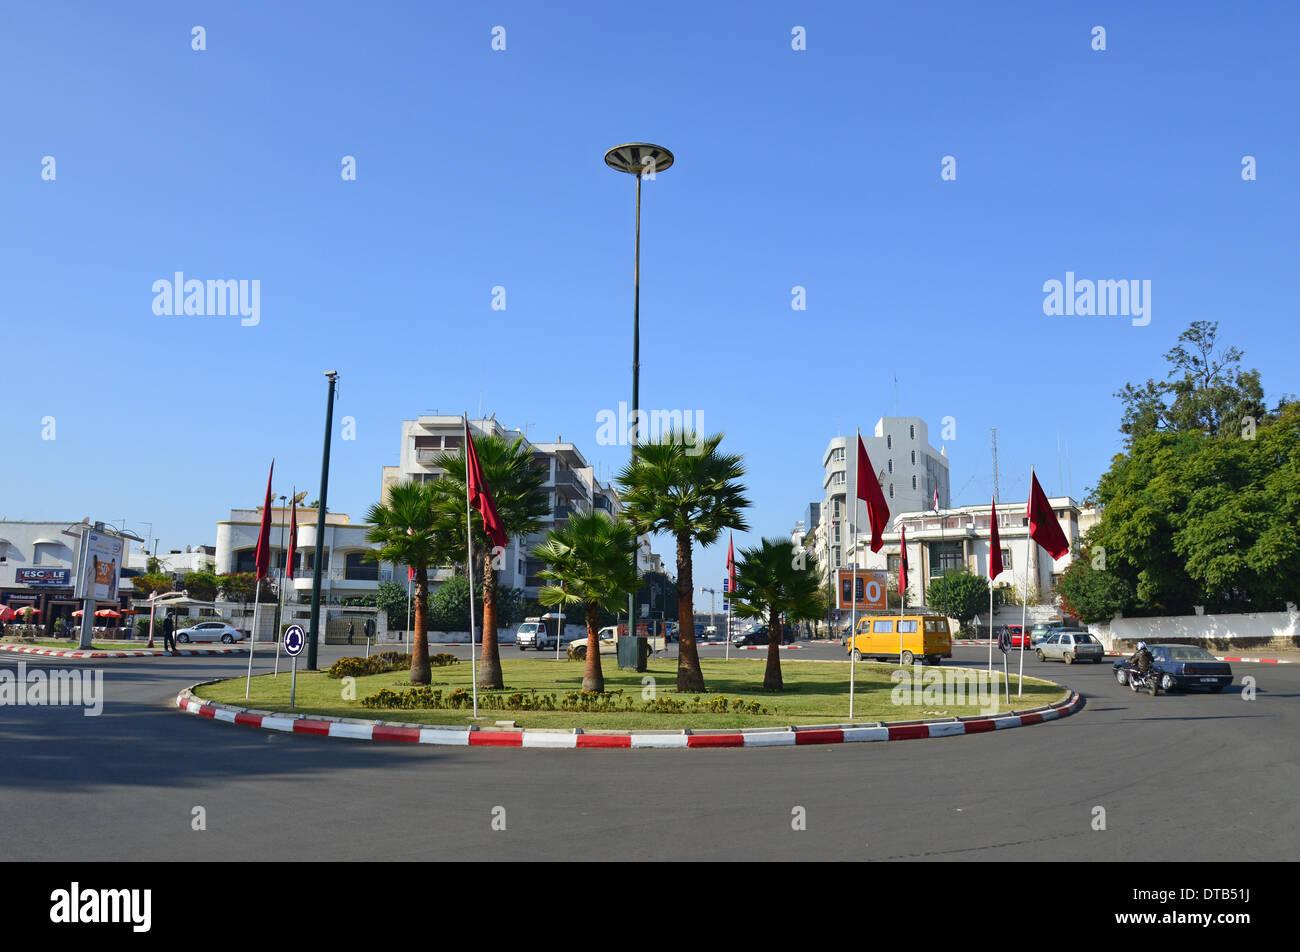 Stadt-Kreisverkehr, Rabat, Rabat-Salé-Zemmour-Zaer Region, Königreich Marokko Stockbild